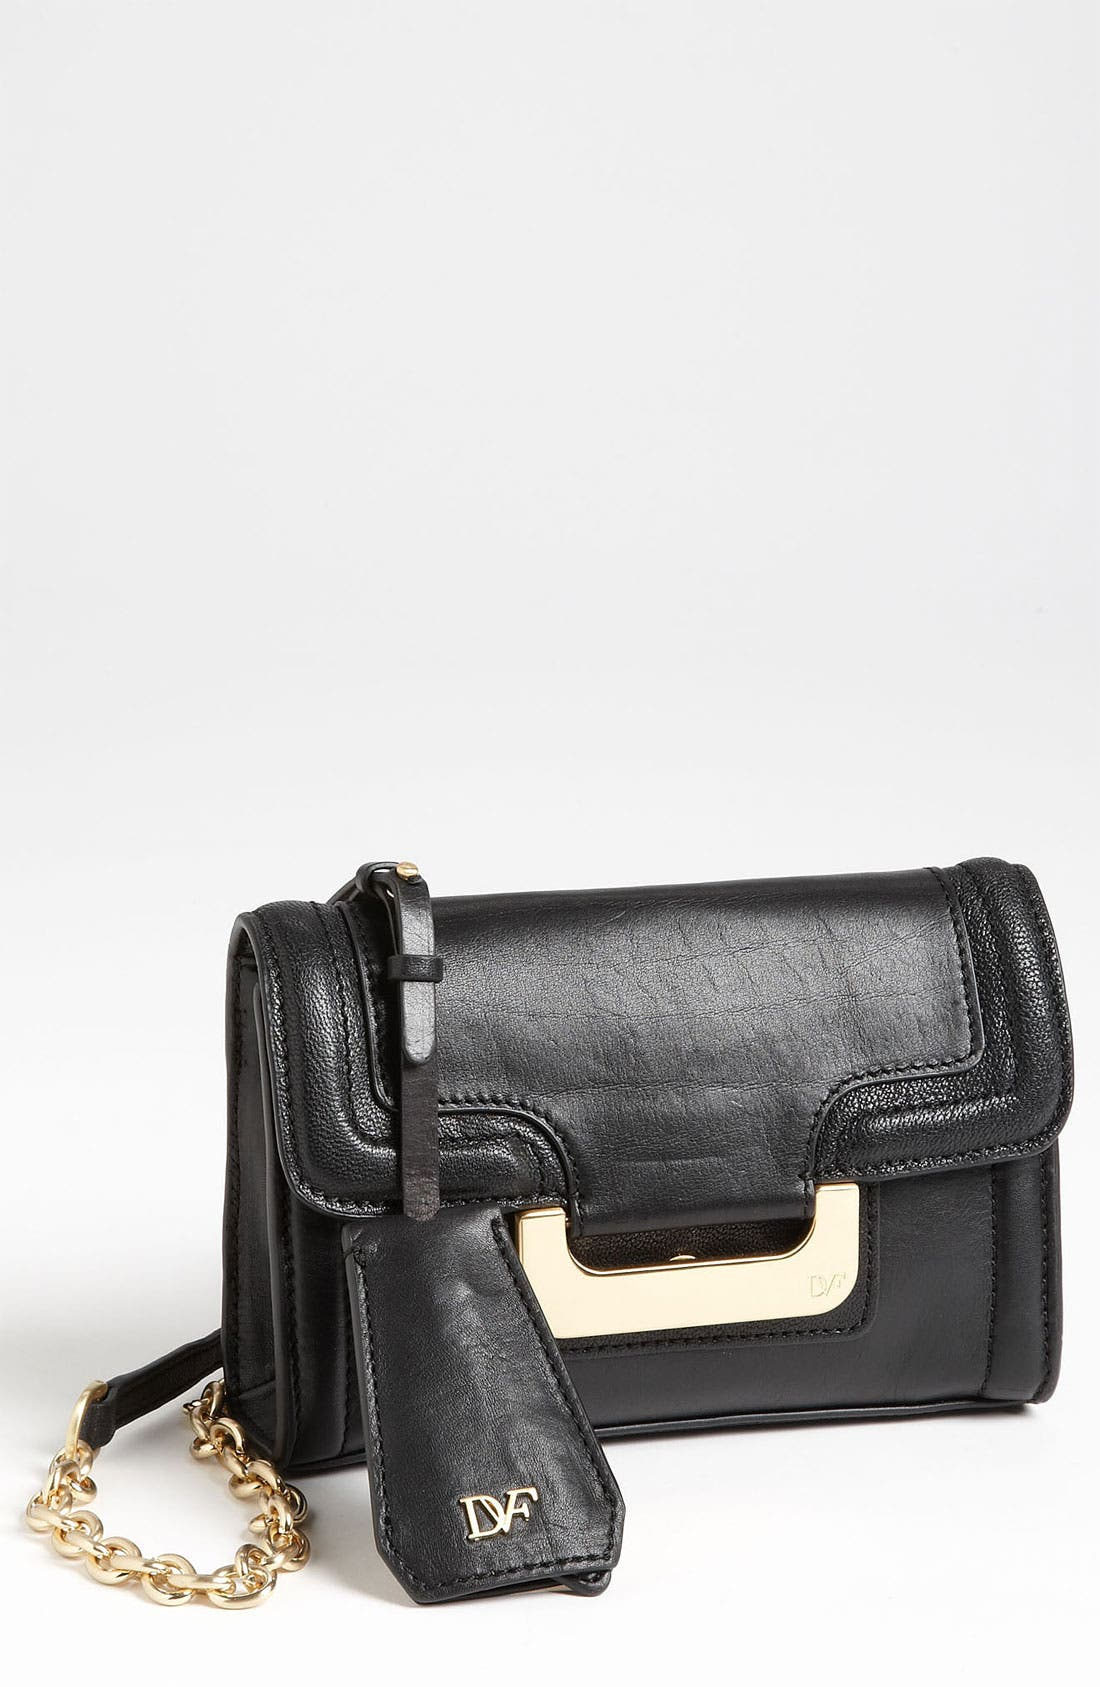 Alternate Image 1 Selected - Diane von Furstenberg 'New Harper - Charlie' Crossbody Bag